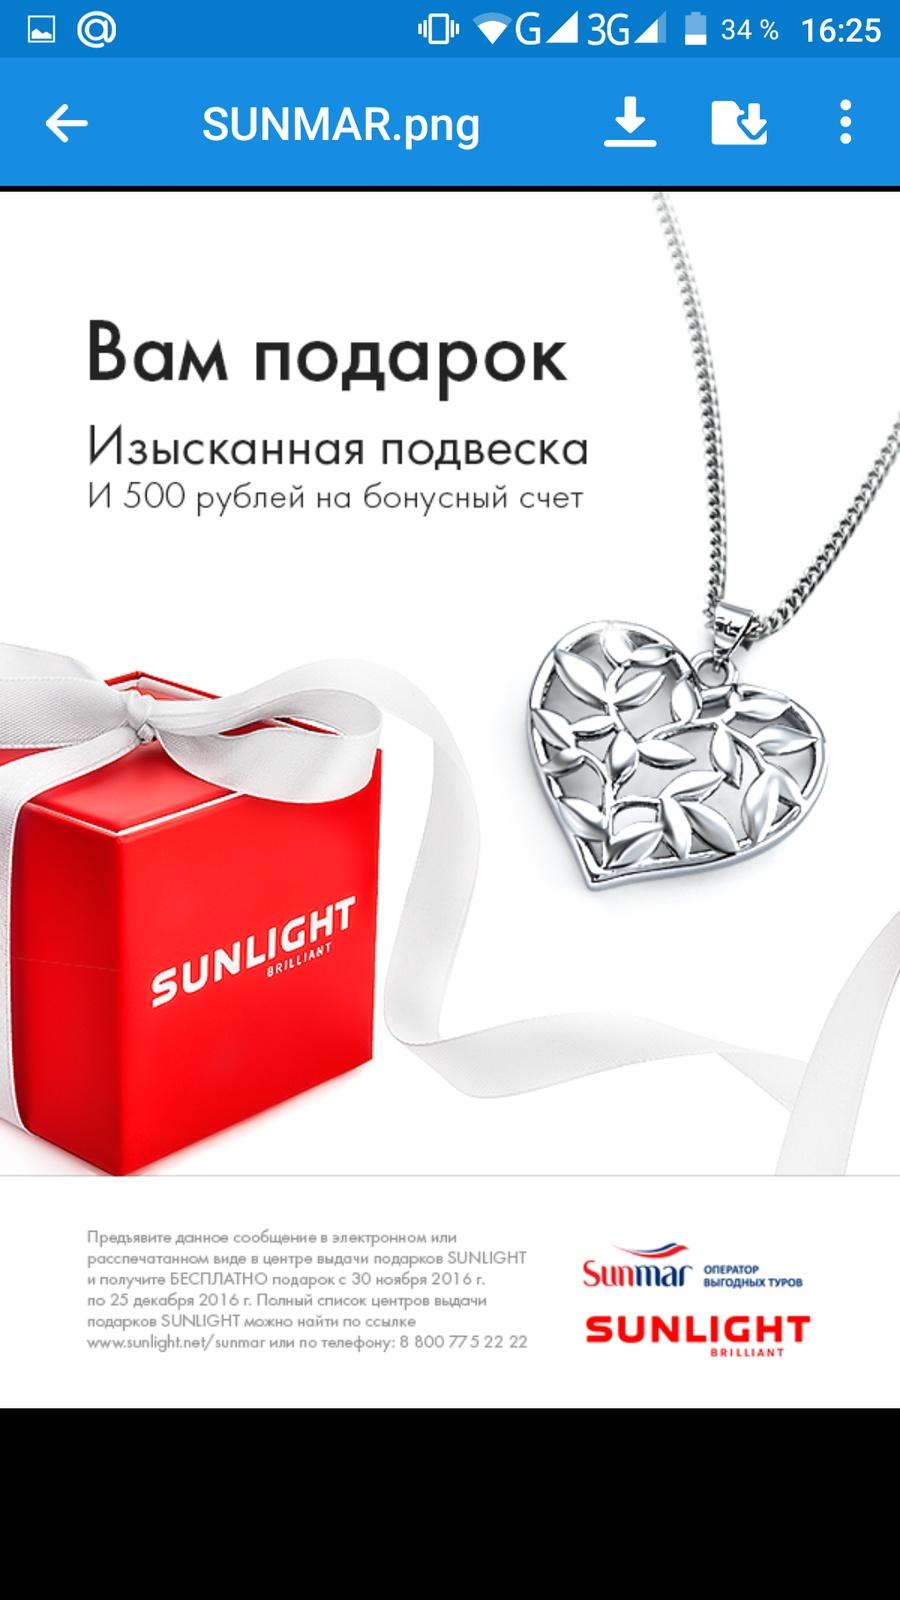 Sunlight в подарок от теле2